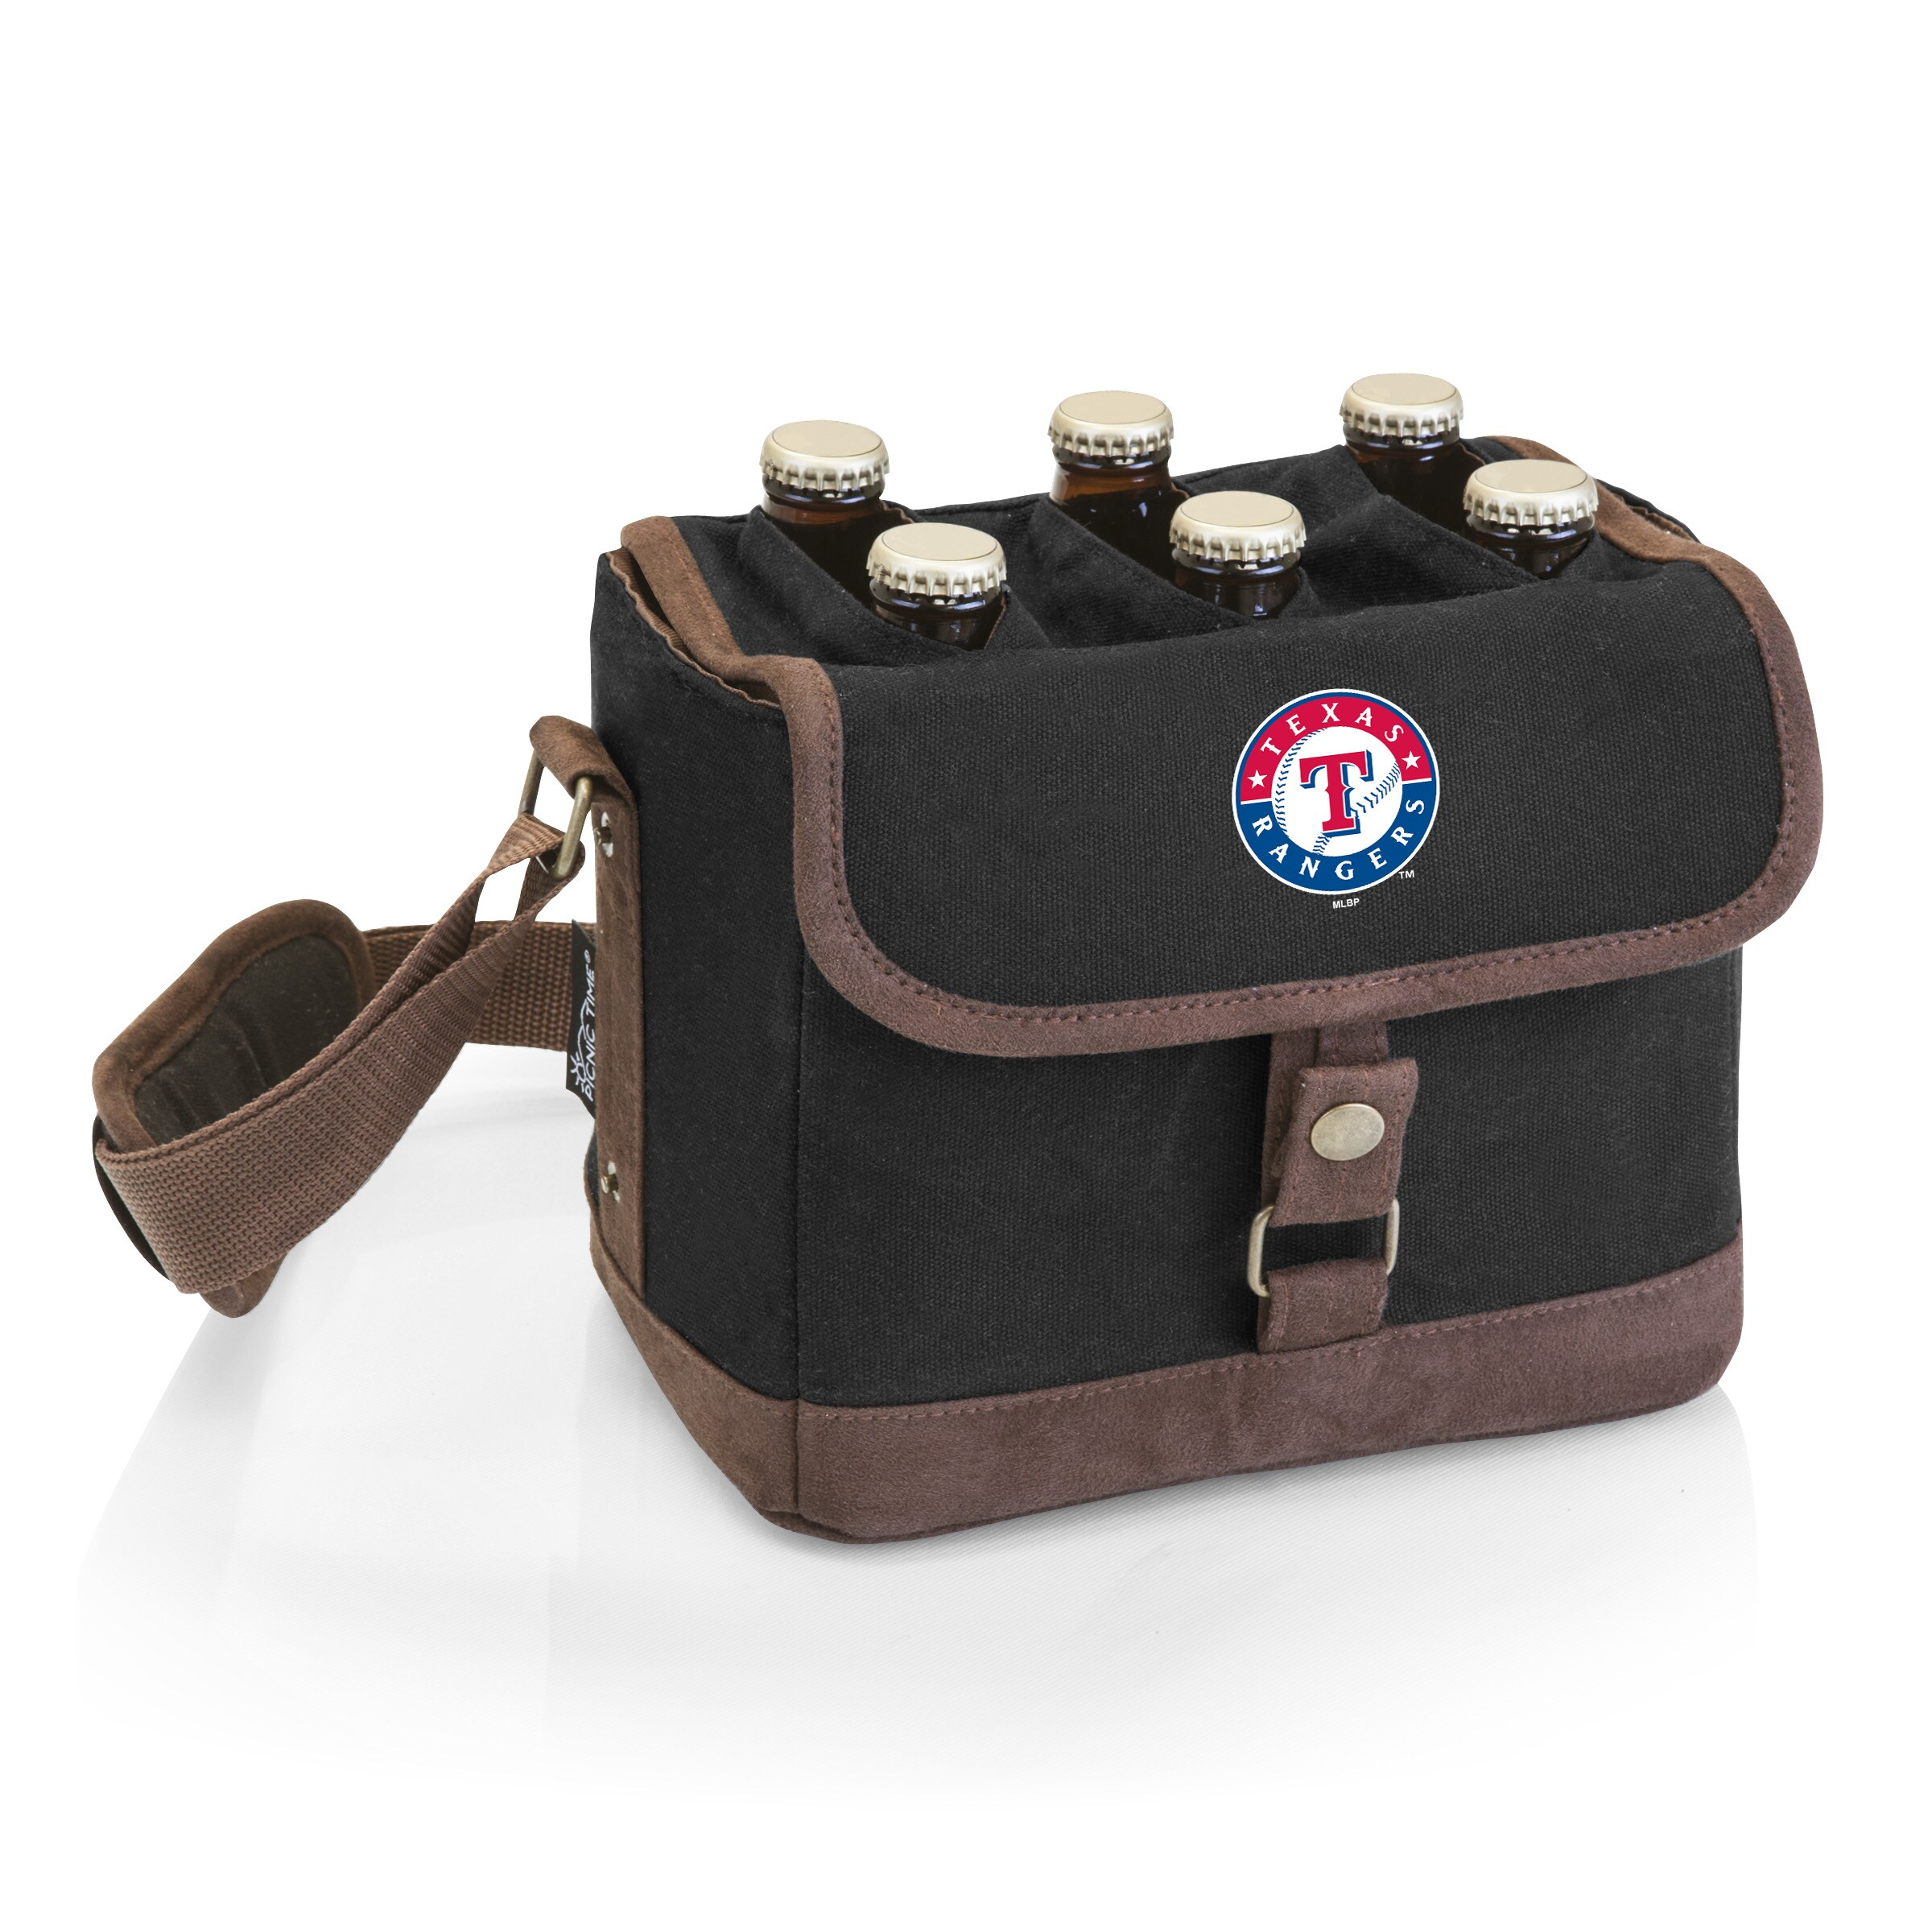 Texas Rangers Beer Caddy Cooler Tote with Opener